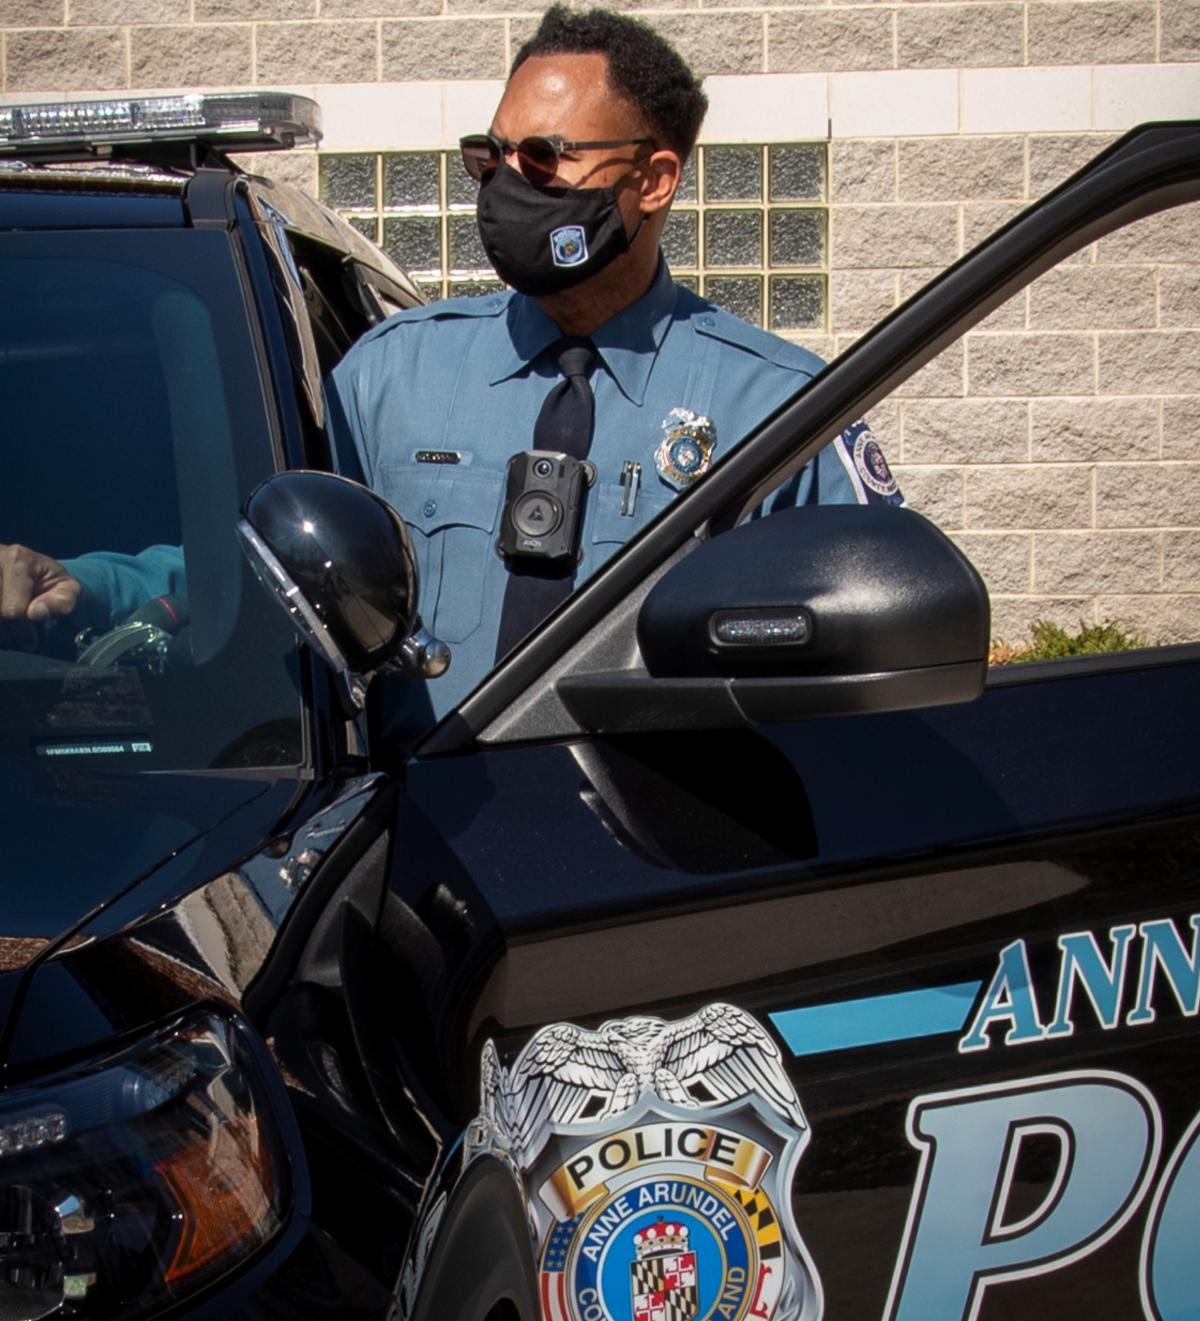 Anne Arundel Police Dept Rolls Out Body-Worn Camera Program